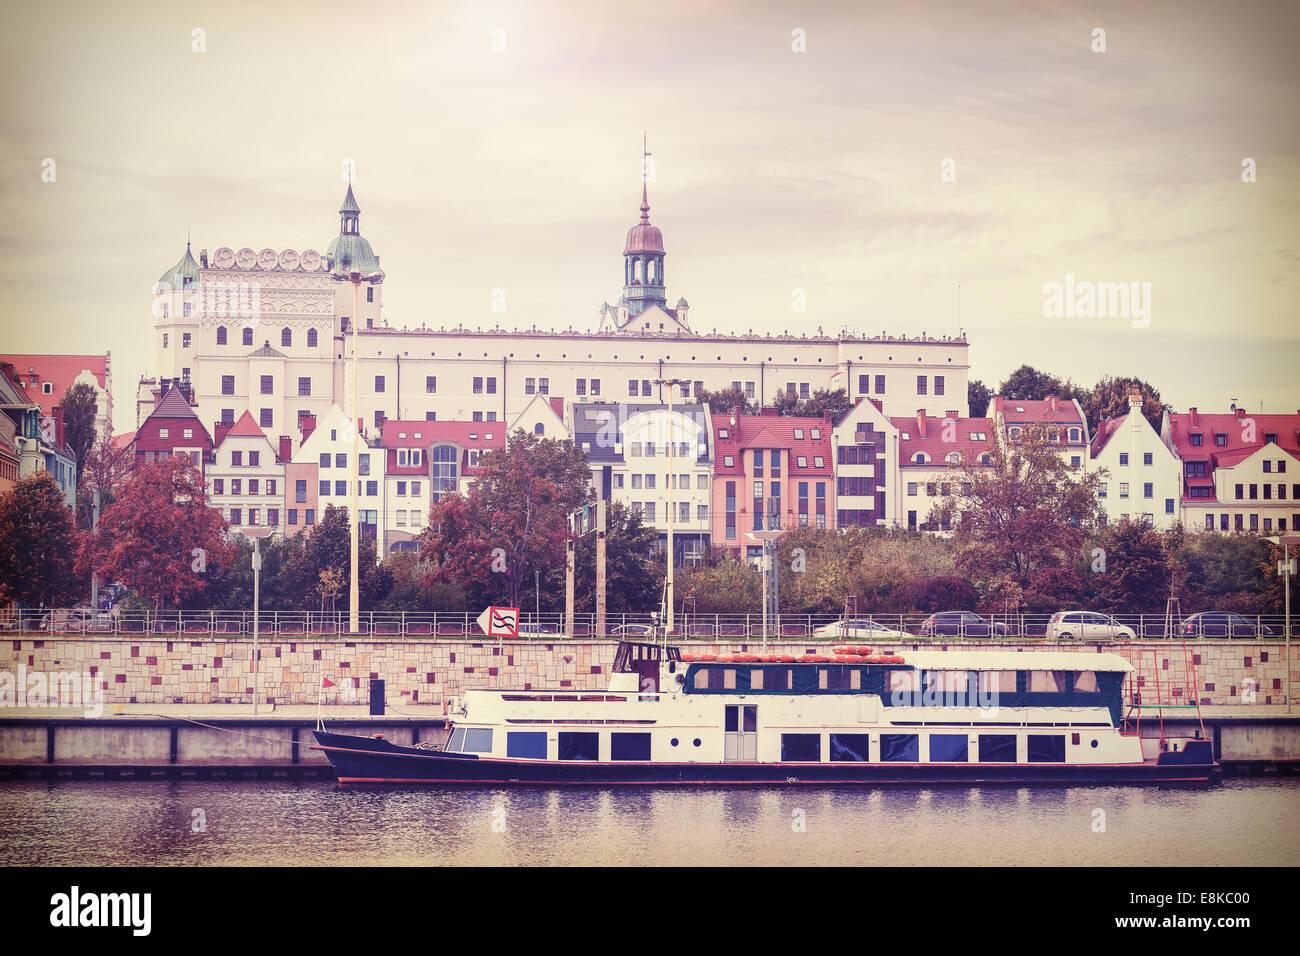 Retro Vintage gefilterte Foto am Flussufer Ansicht Szczecin, Polen Stockbild